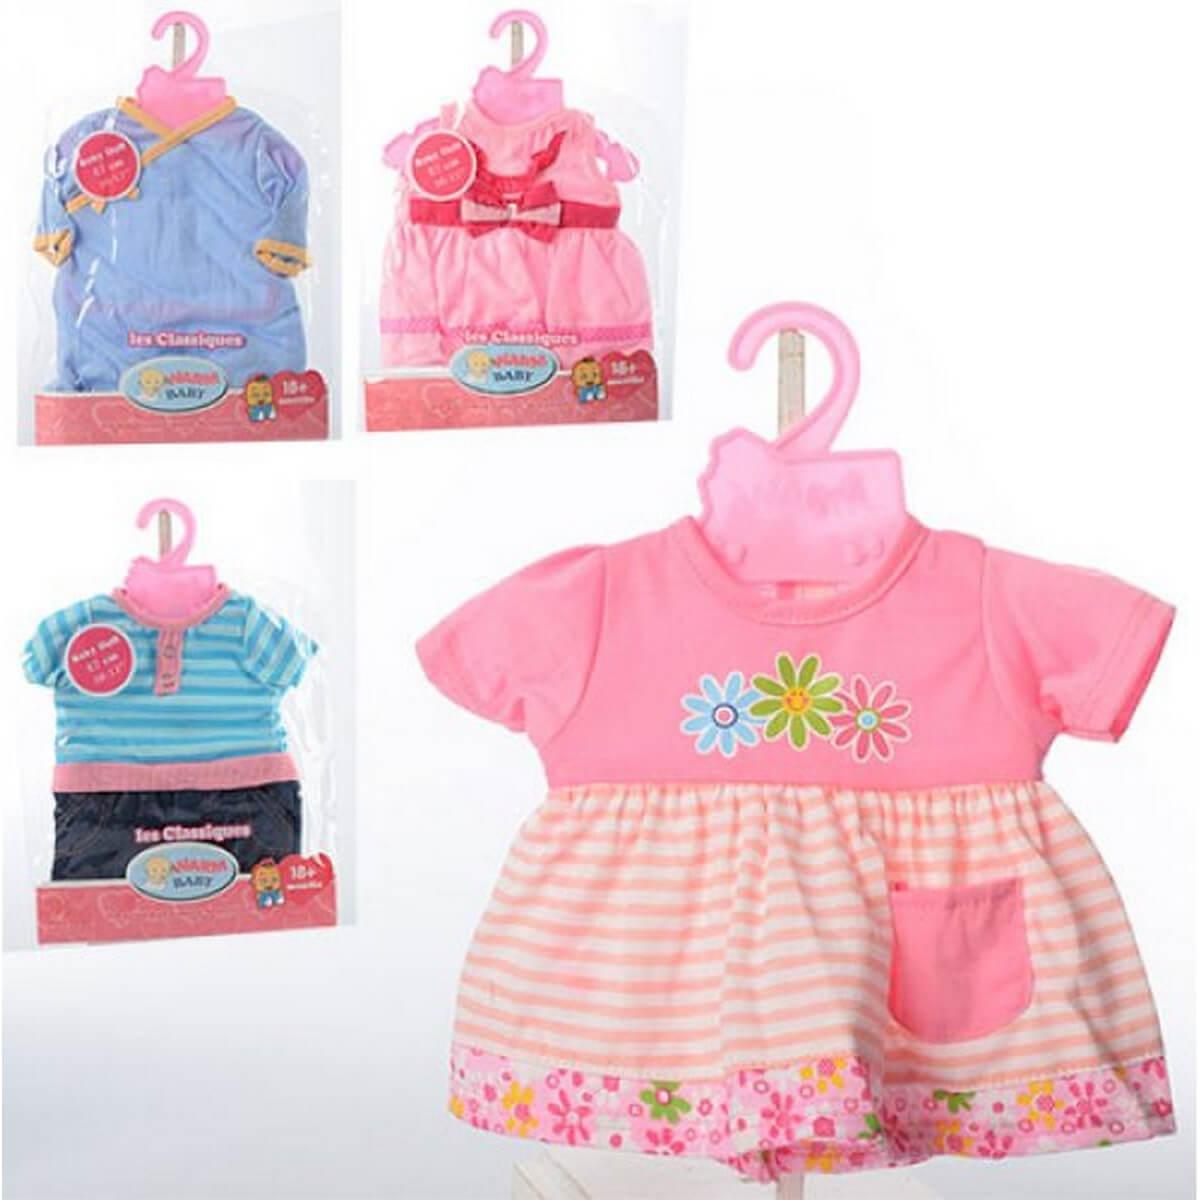 baby doll Одежда для пупса 4 вида BJ-71B-409-17-22